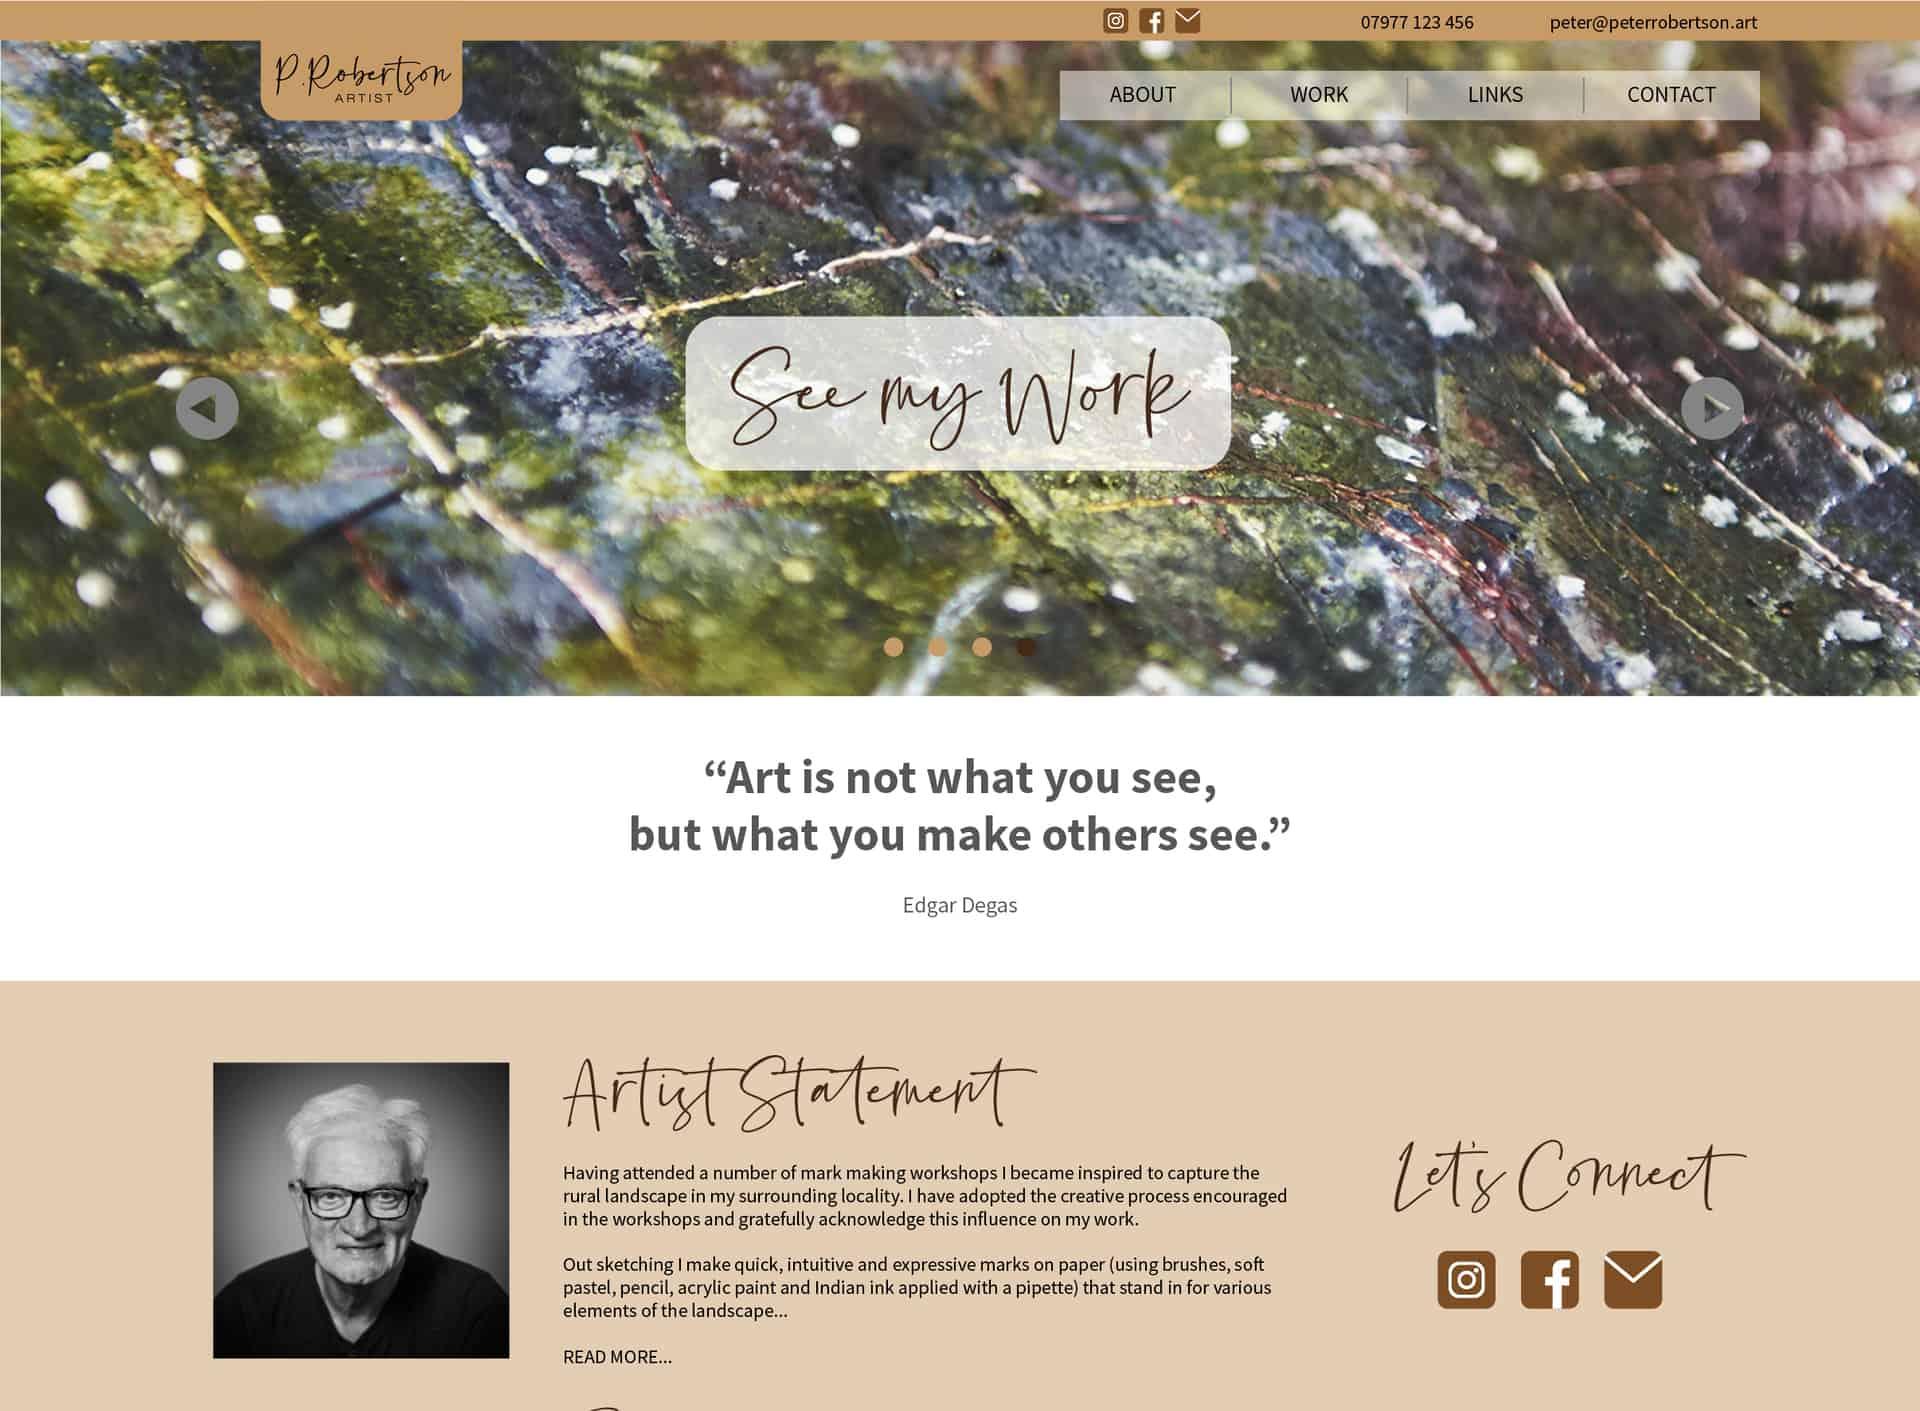 Peter Robertson Art website home page